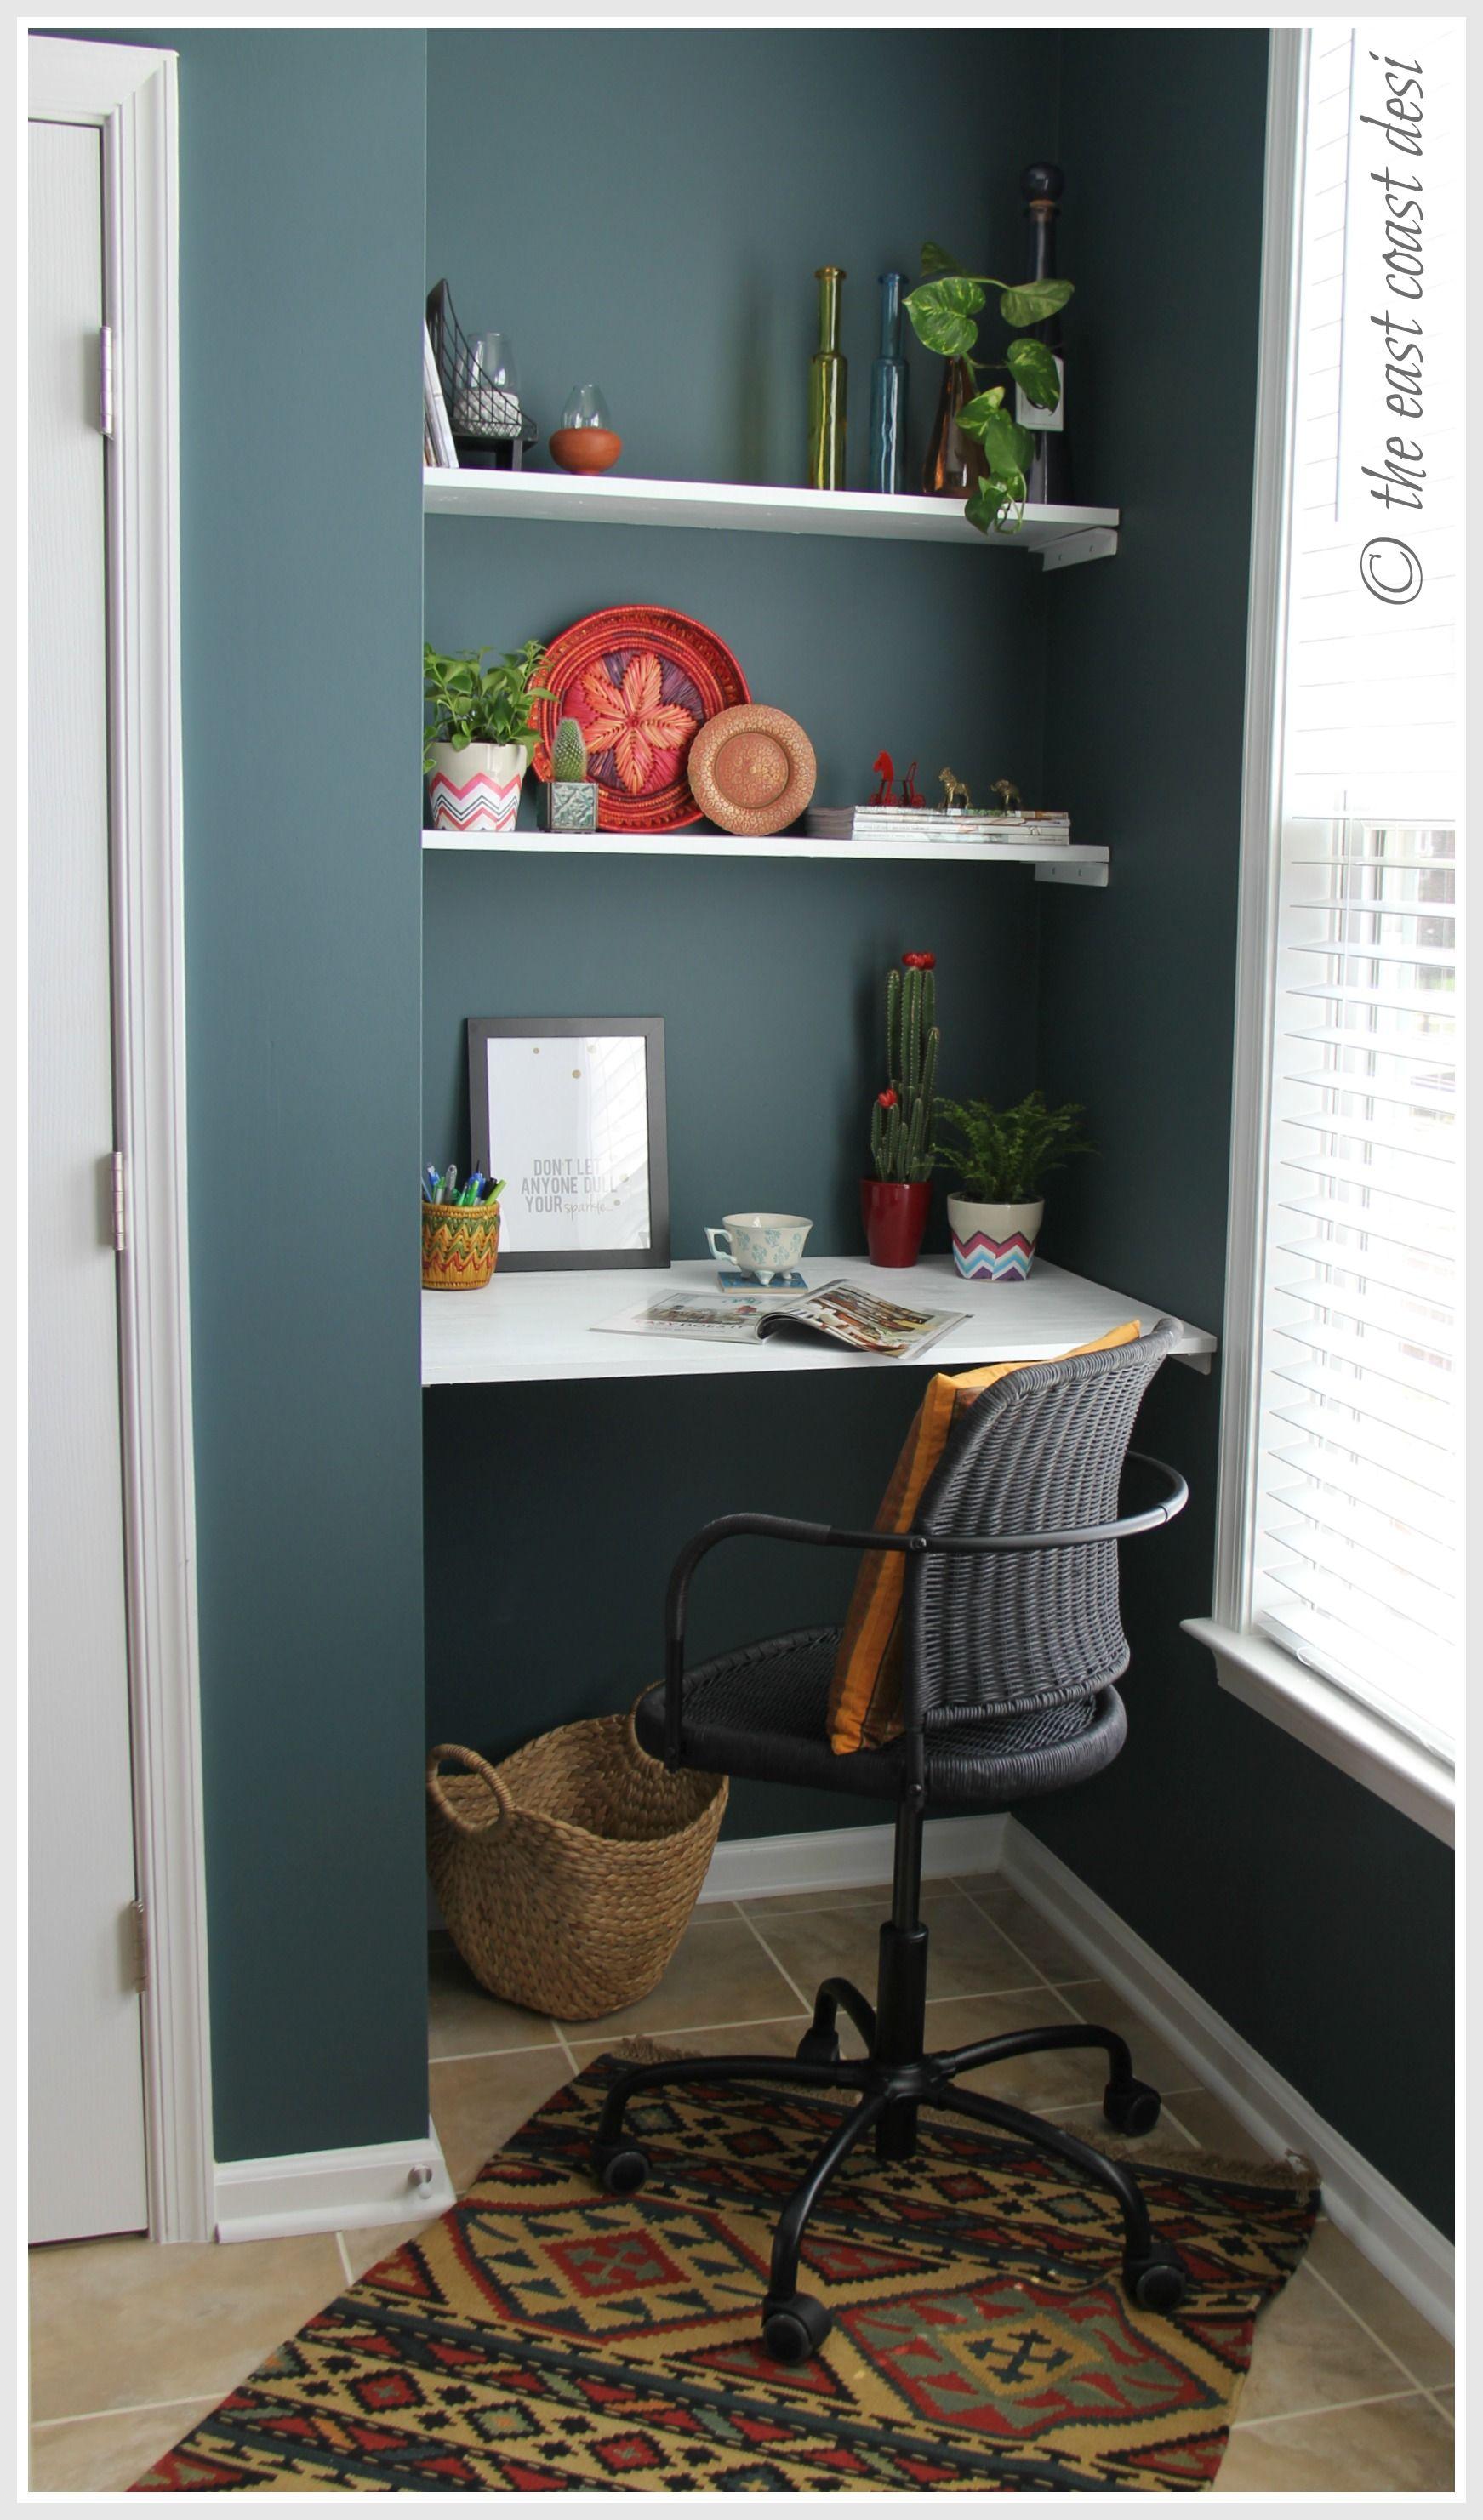 Niche converted to a miniworking desk. DIY shelves (under